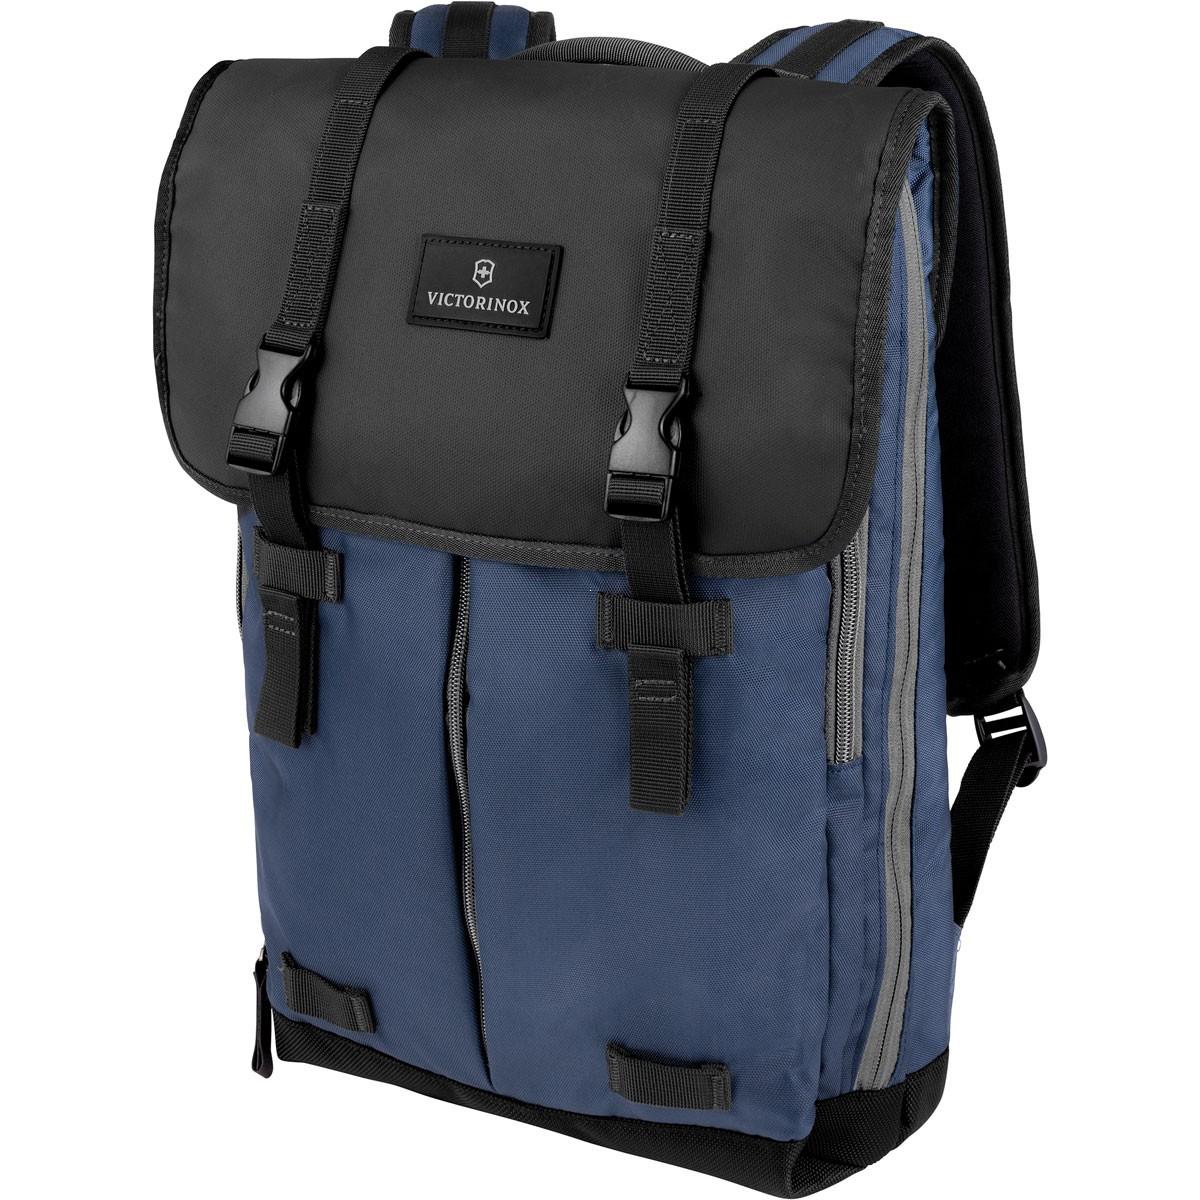 424da0587d270 Victorinox Altmont ™ 3.0 Plecak miejski Flapover niebieski ...